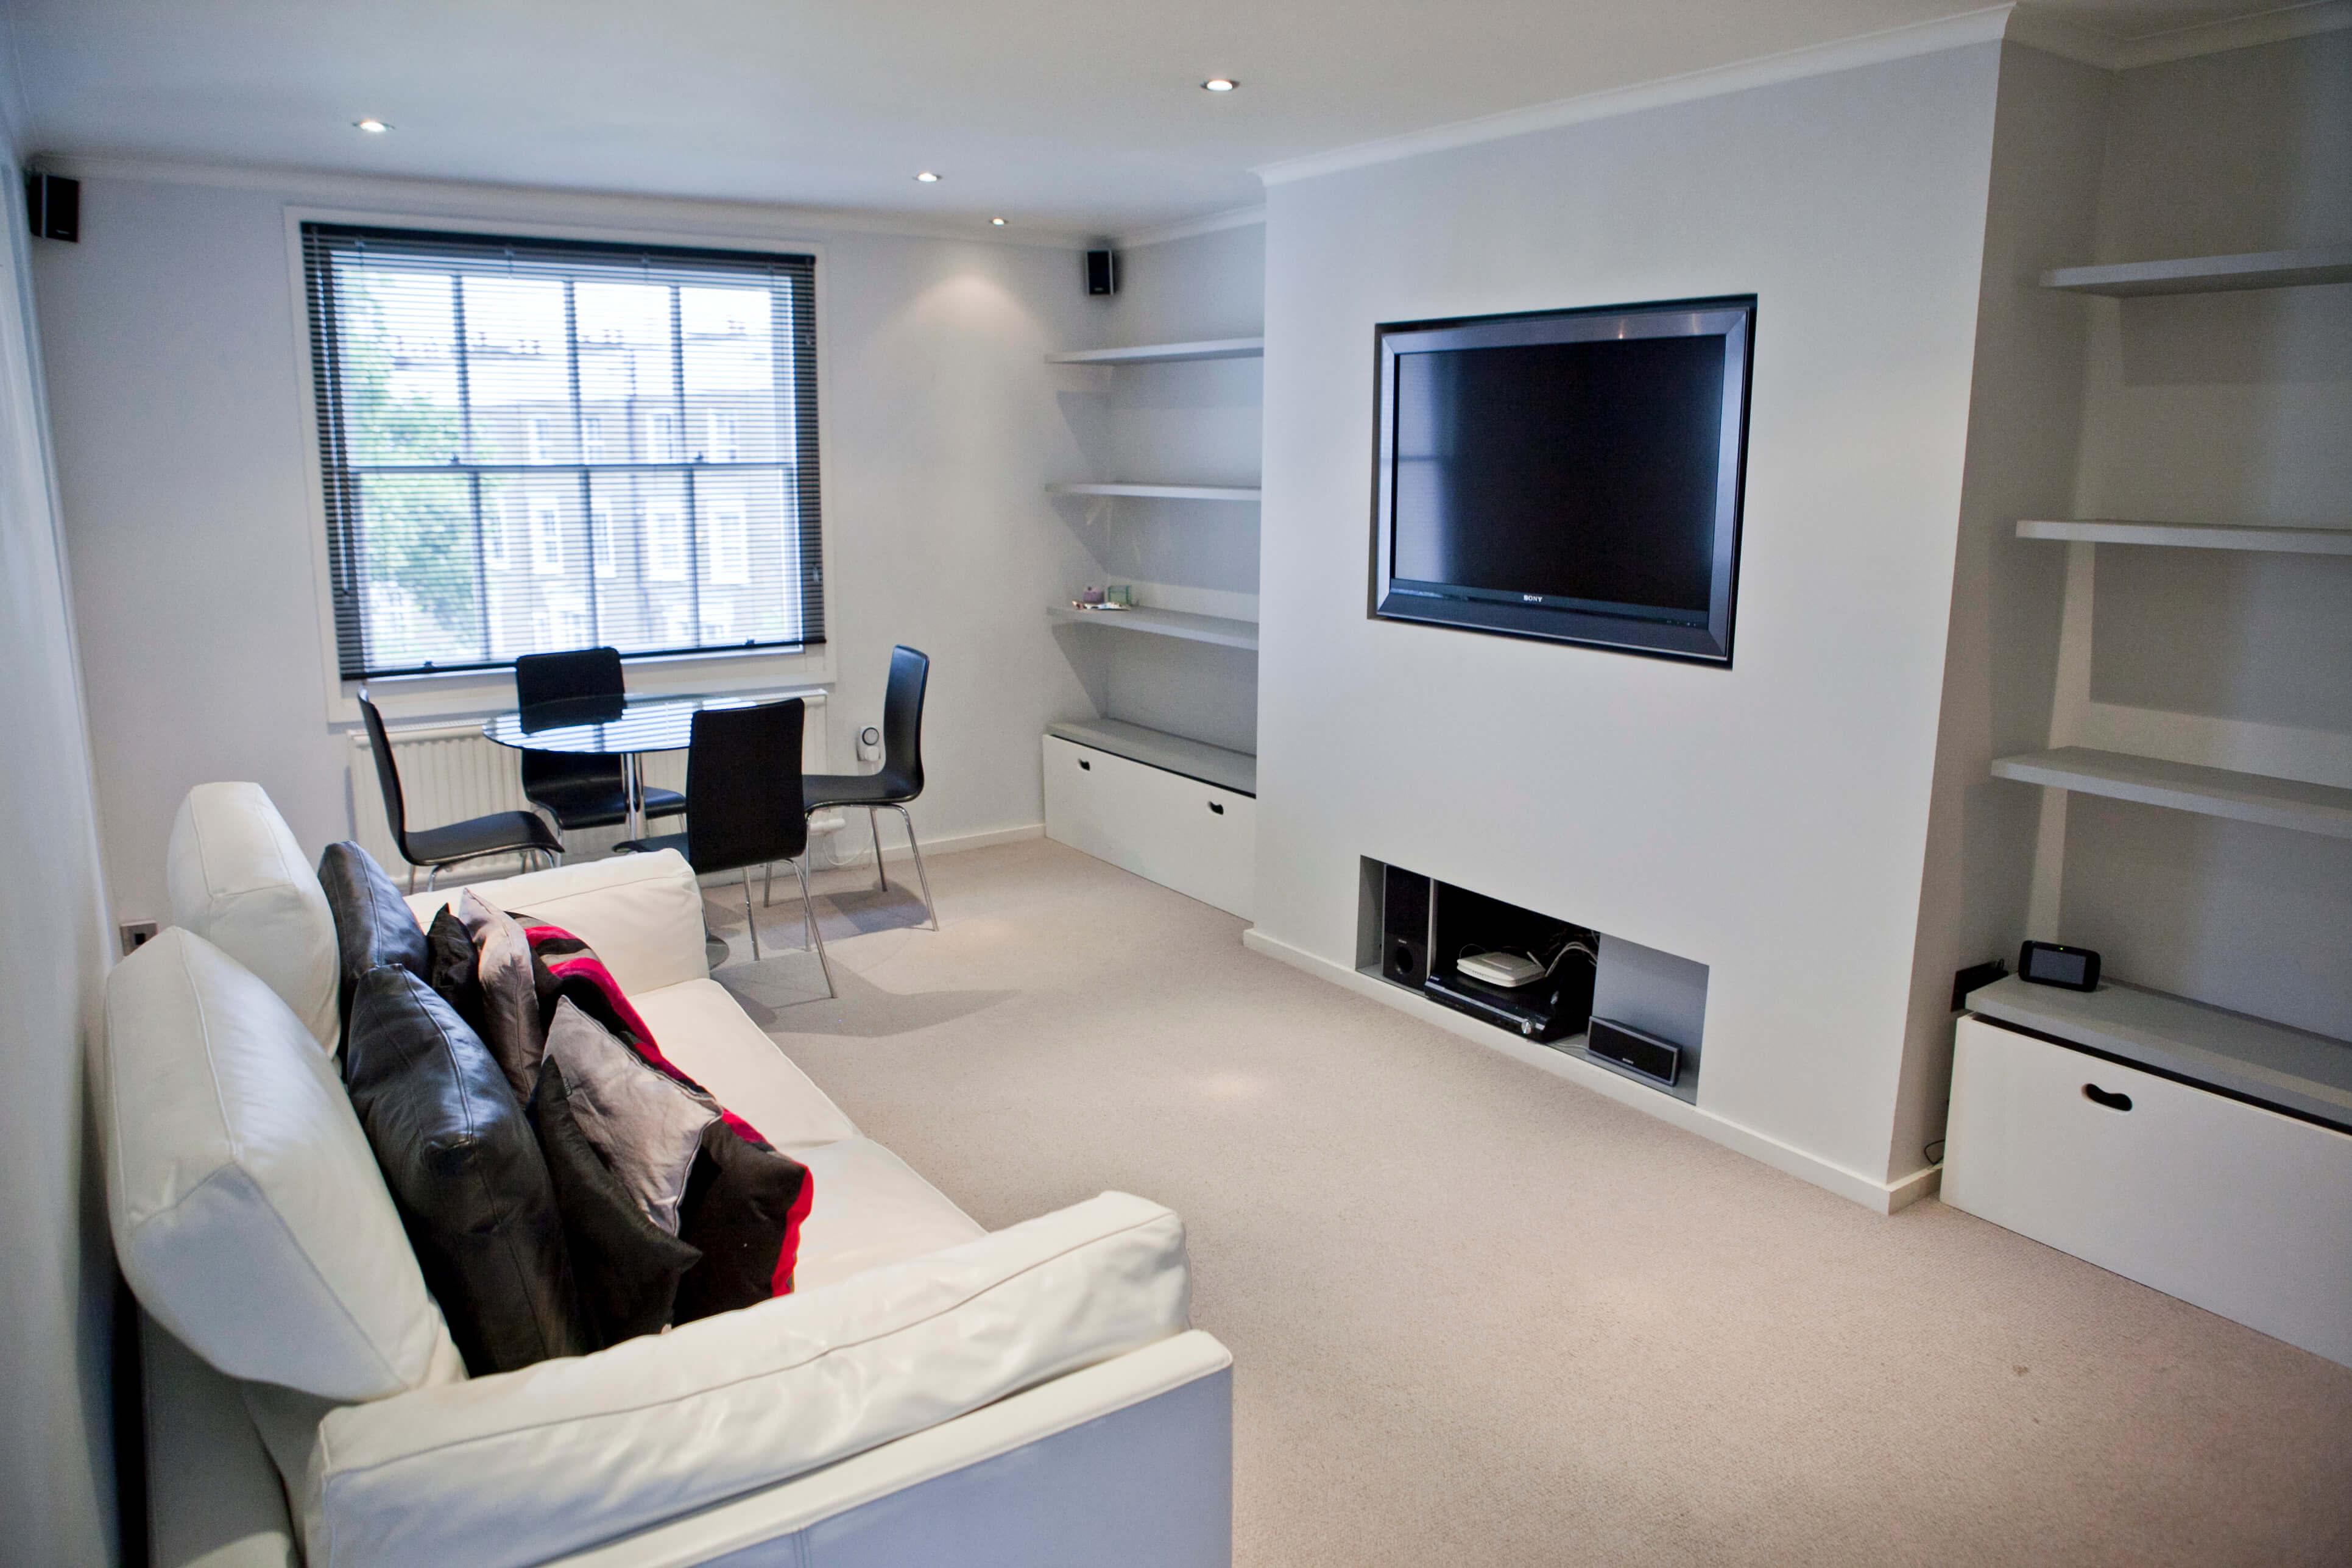 IMG 30971 - Property Listings